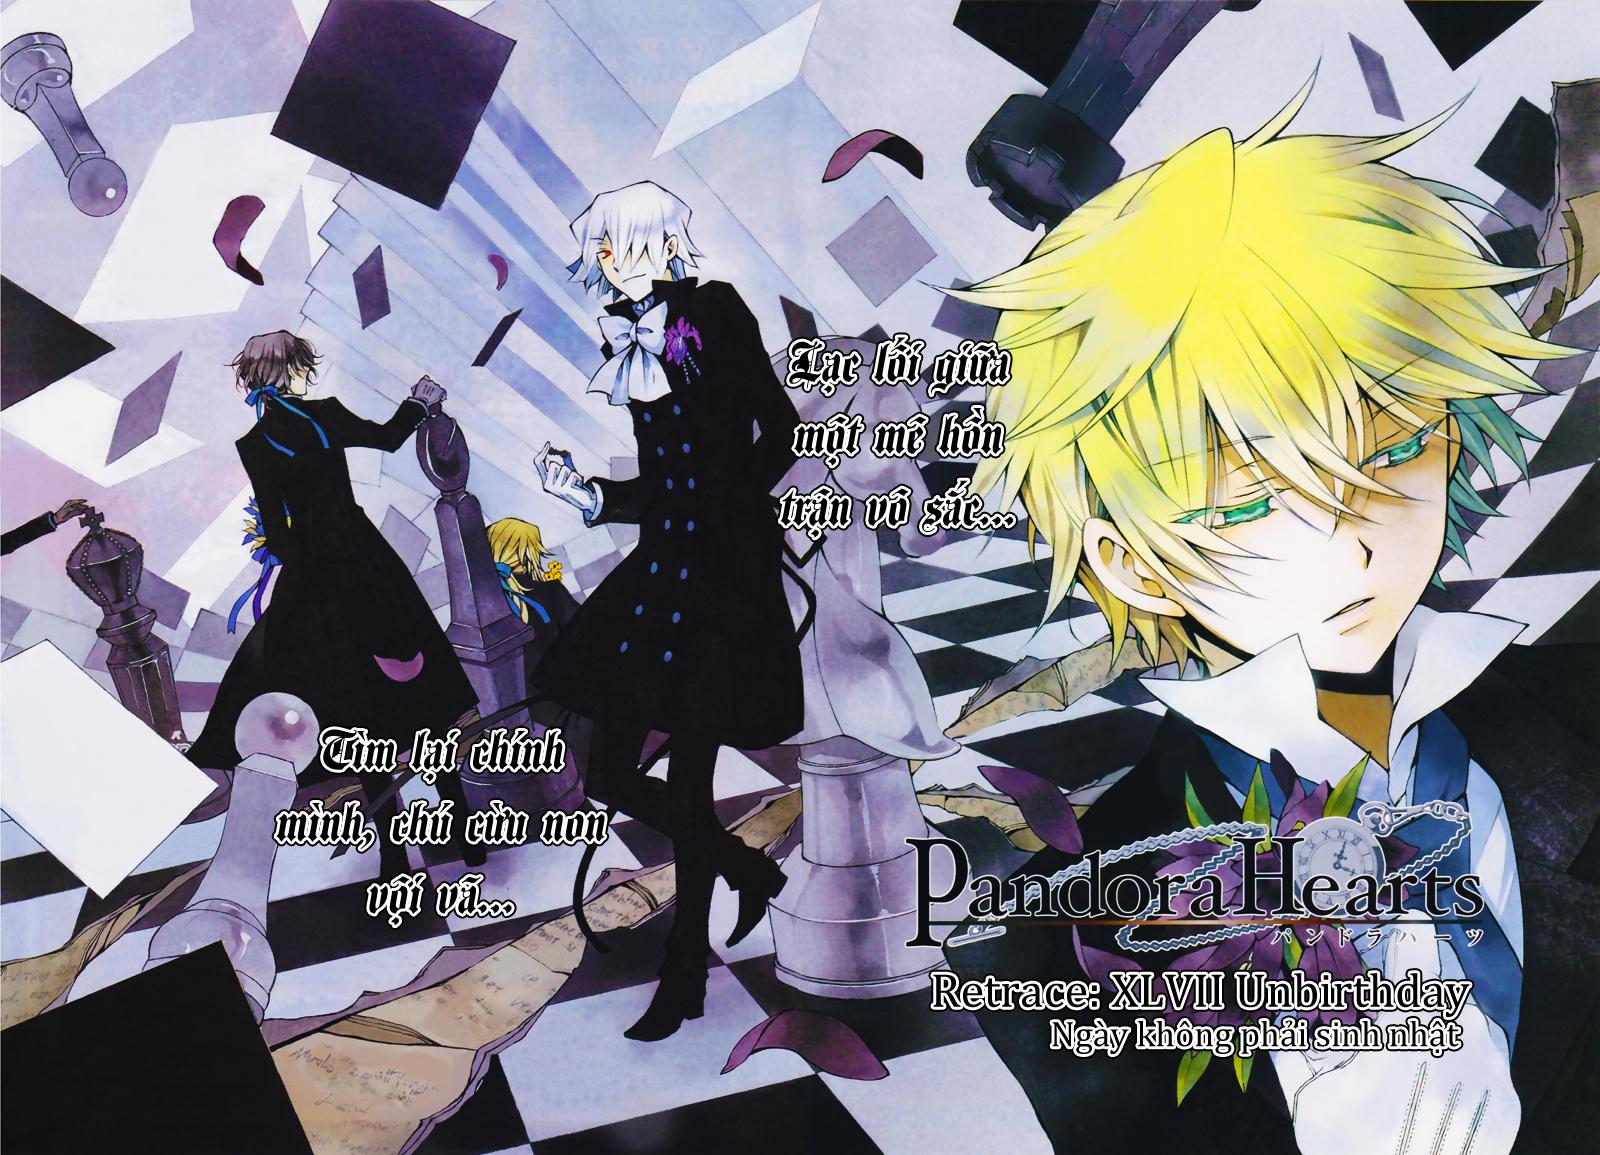 Pandora Hearts chương 047 - retrace: xlvii unbirthday trang 2